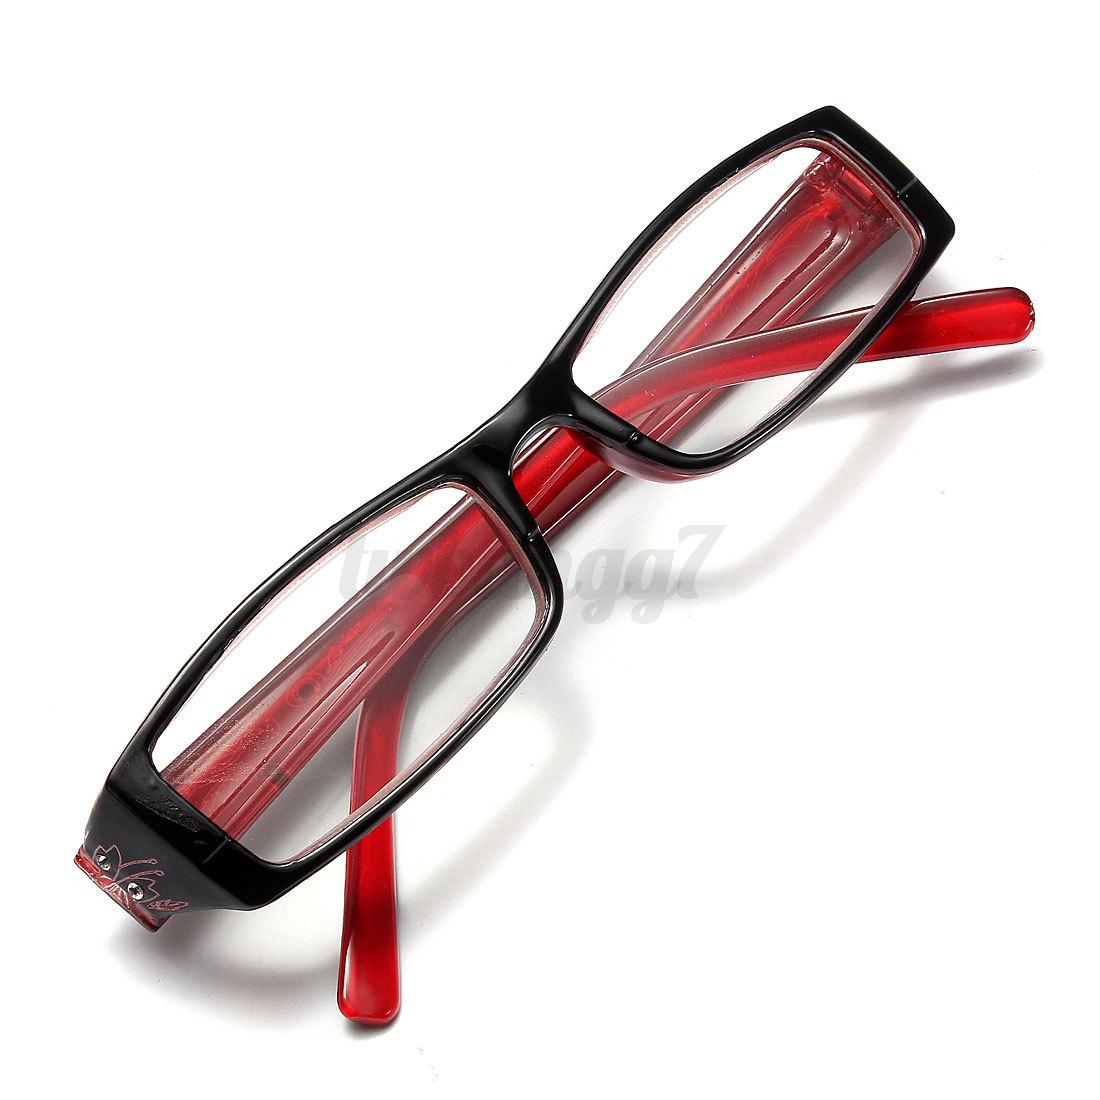 c4c701bd52 Cat Eye Sunglasses Ray Ban  19 99 Flowers « Heritage Malta